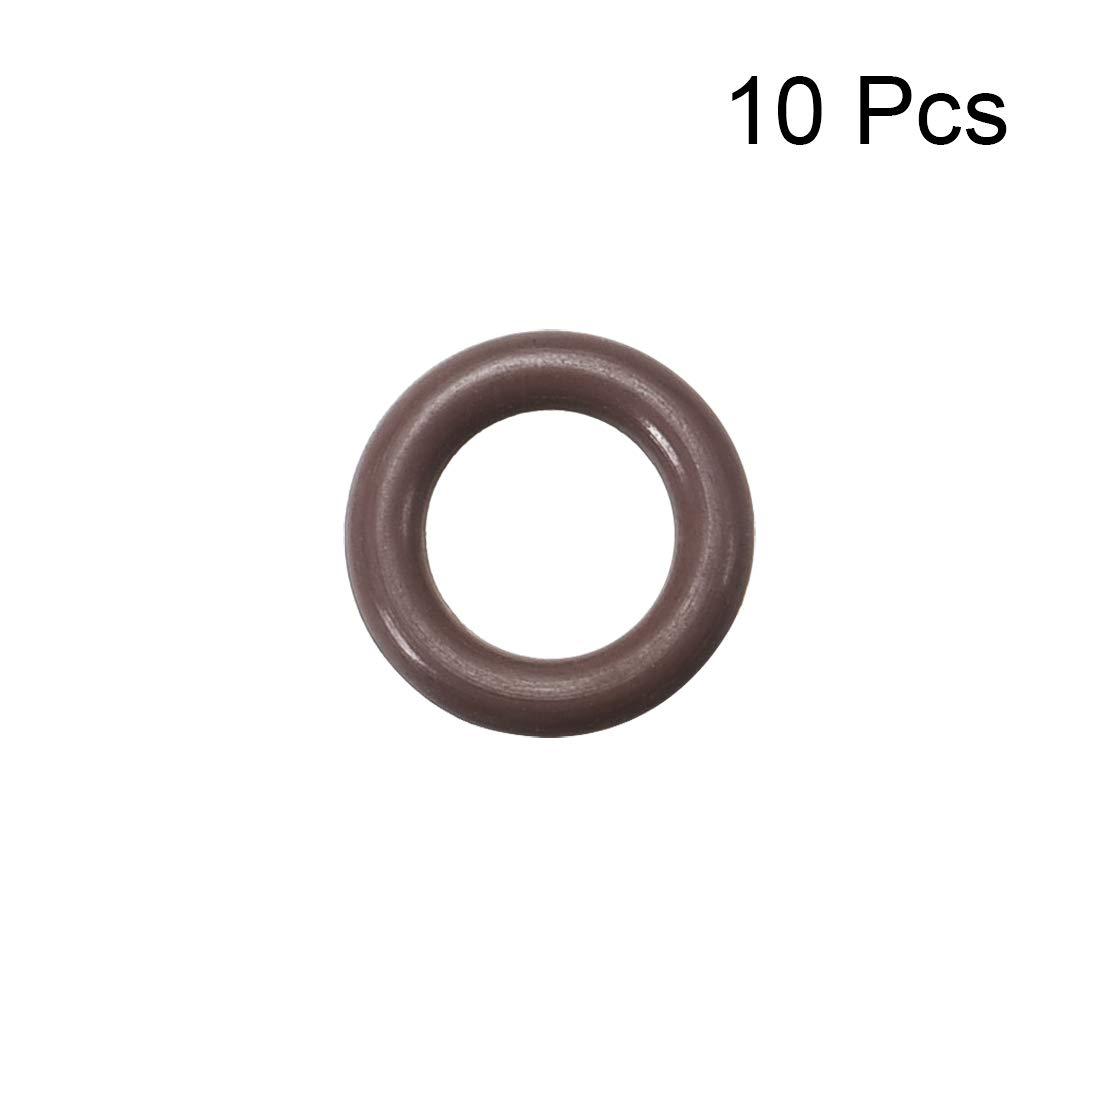 Seal Gasket Brown 10Pcs uxcell Fluorine Rubber O Rings 5mm OD 1.9mm Width 1.2mm Inner Diameter